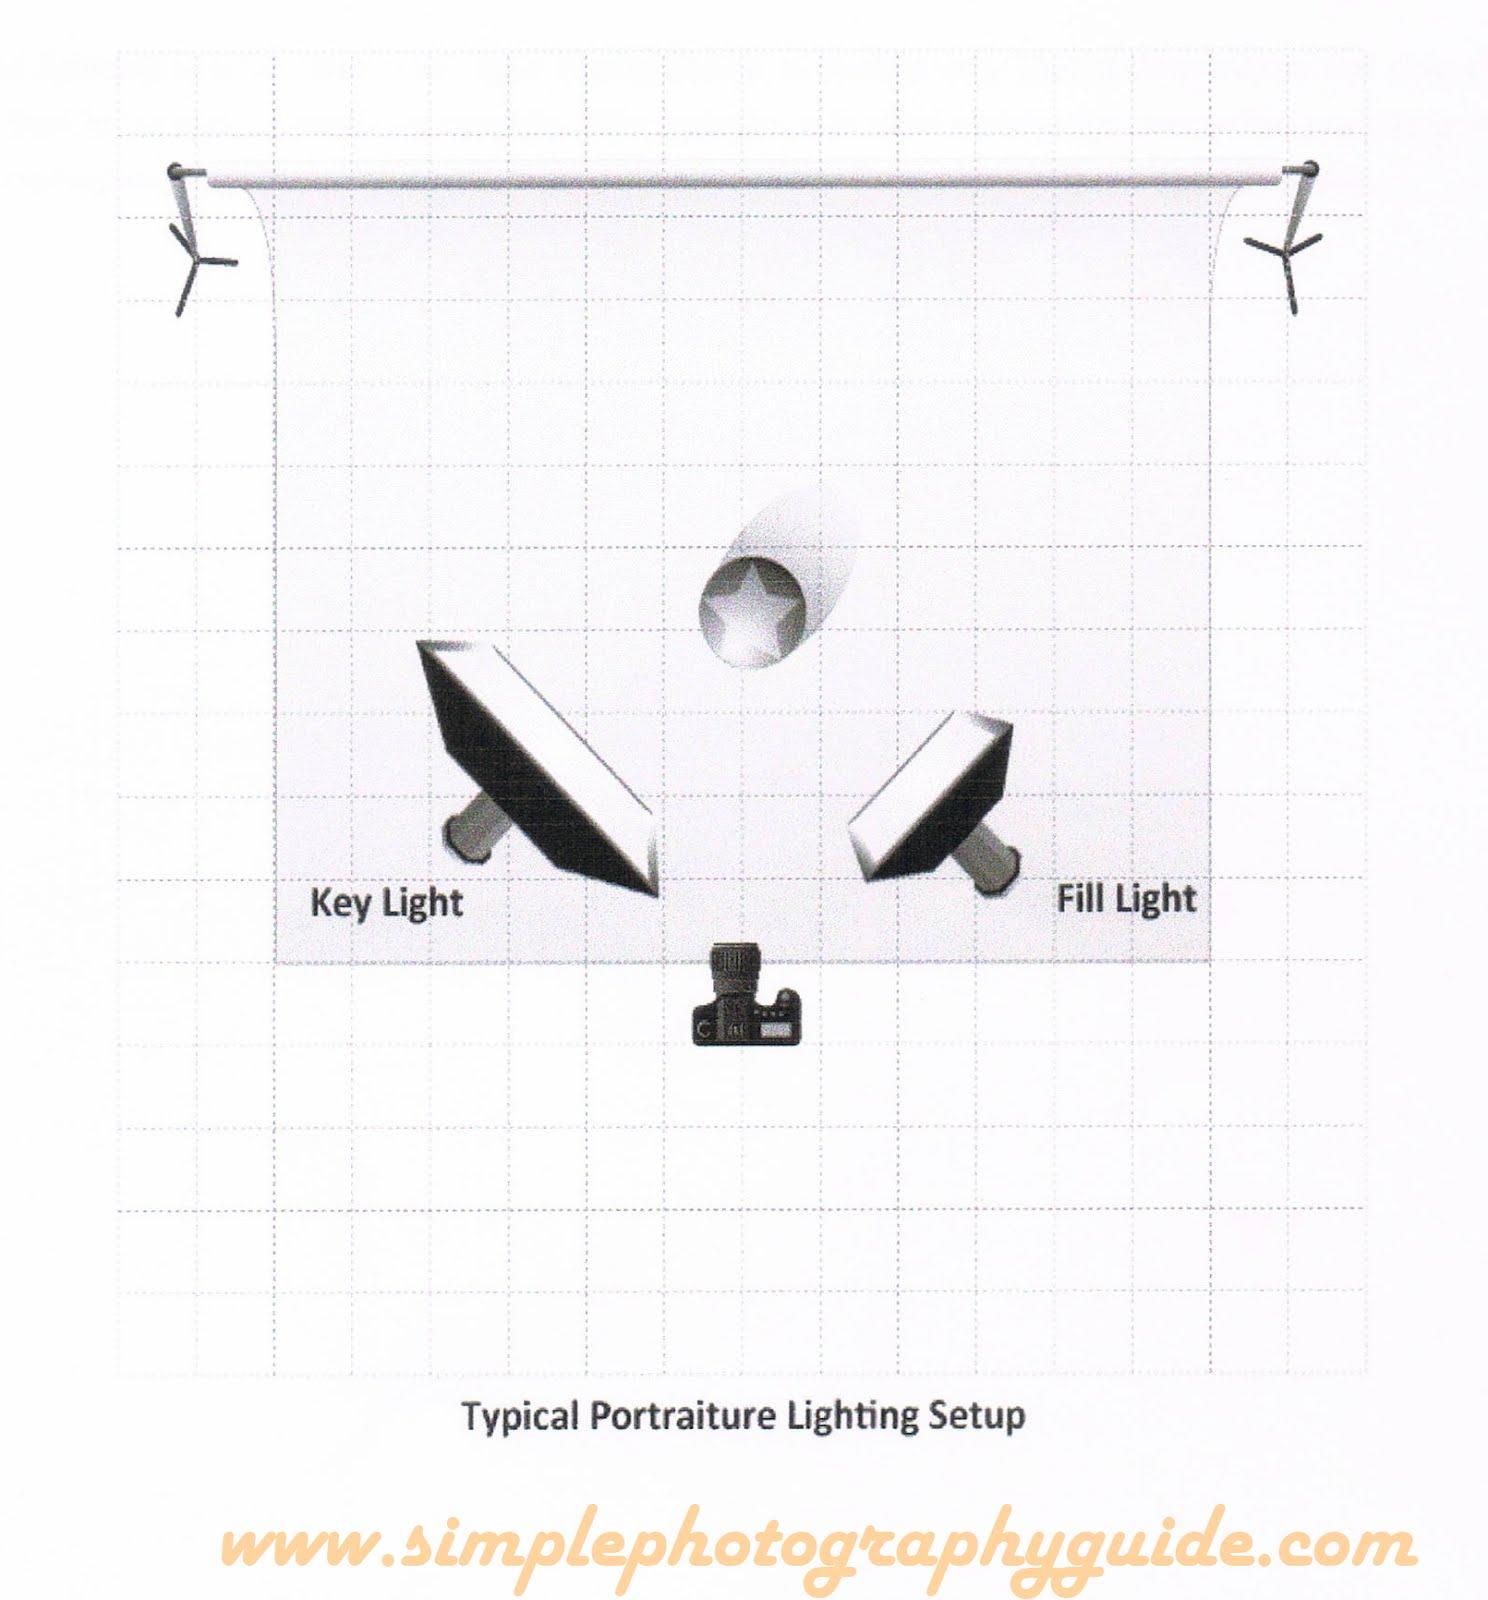 Simple Photography Guide: Basic Portraiture Setup, Broad